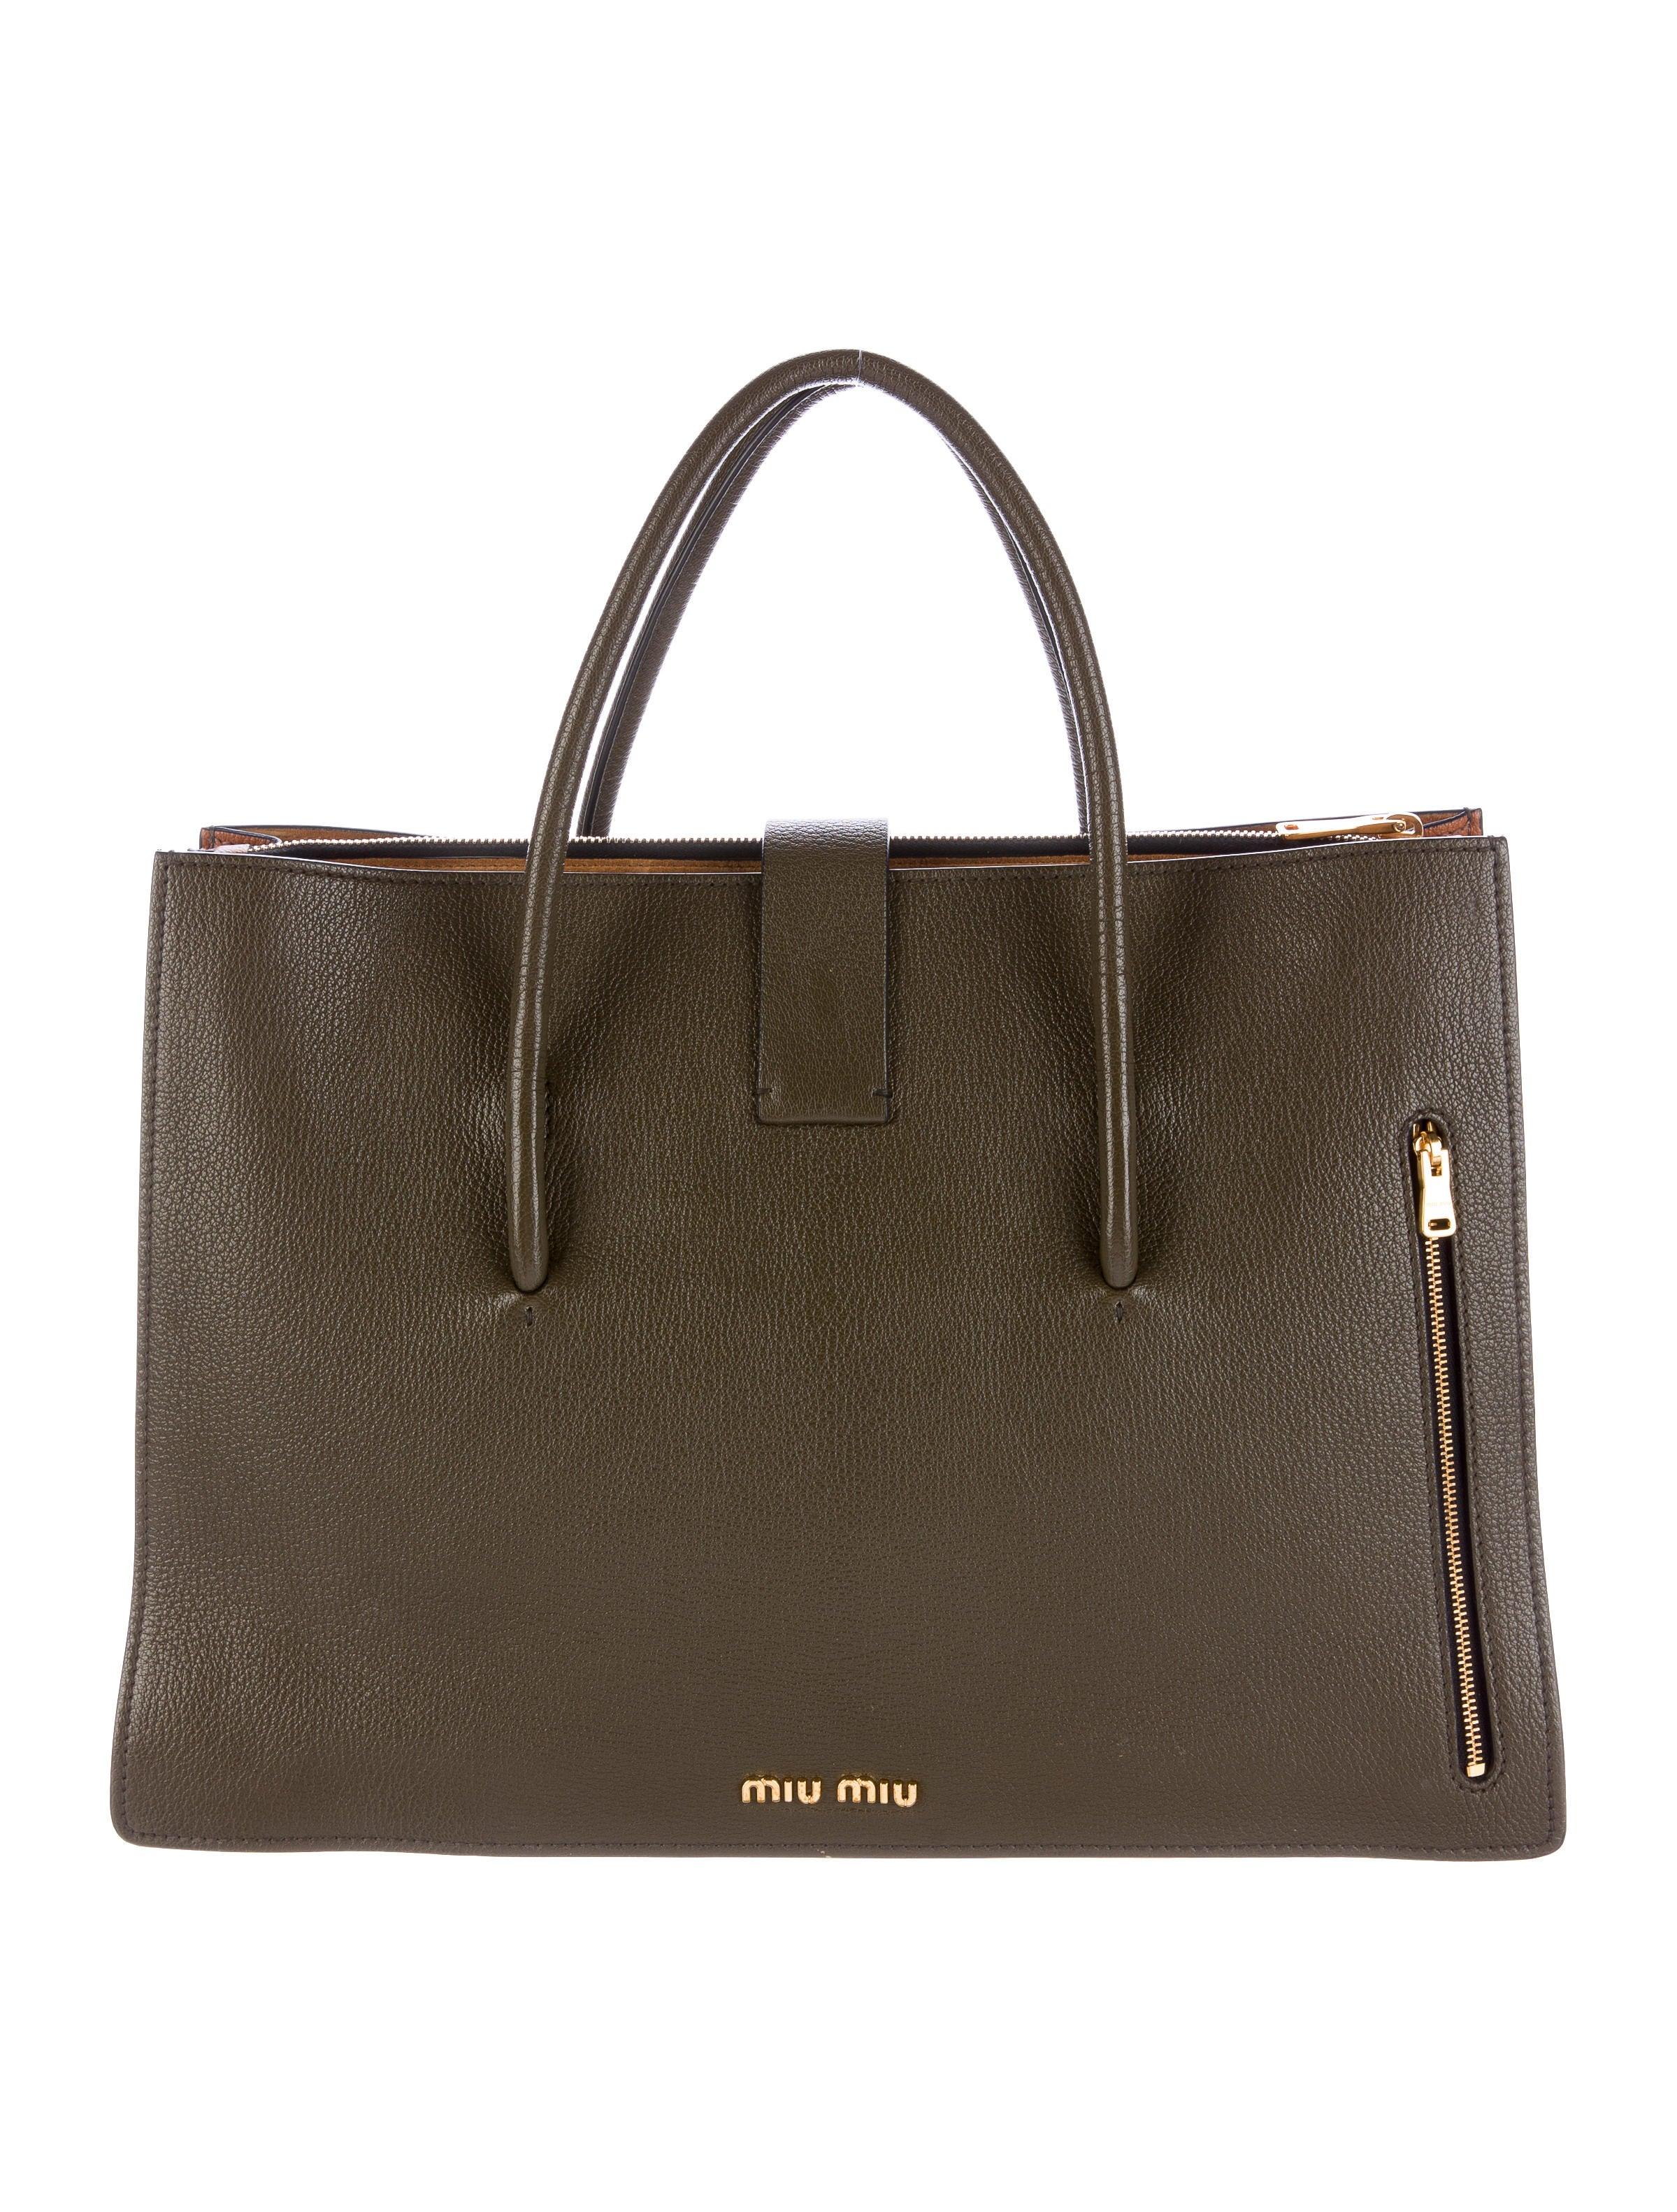 miu miu madras shopping tote handbags miu47730 the realreal. Black Bedroom Furniture Sets. Home Design Ideas